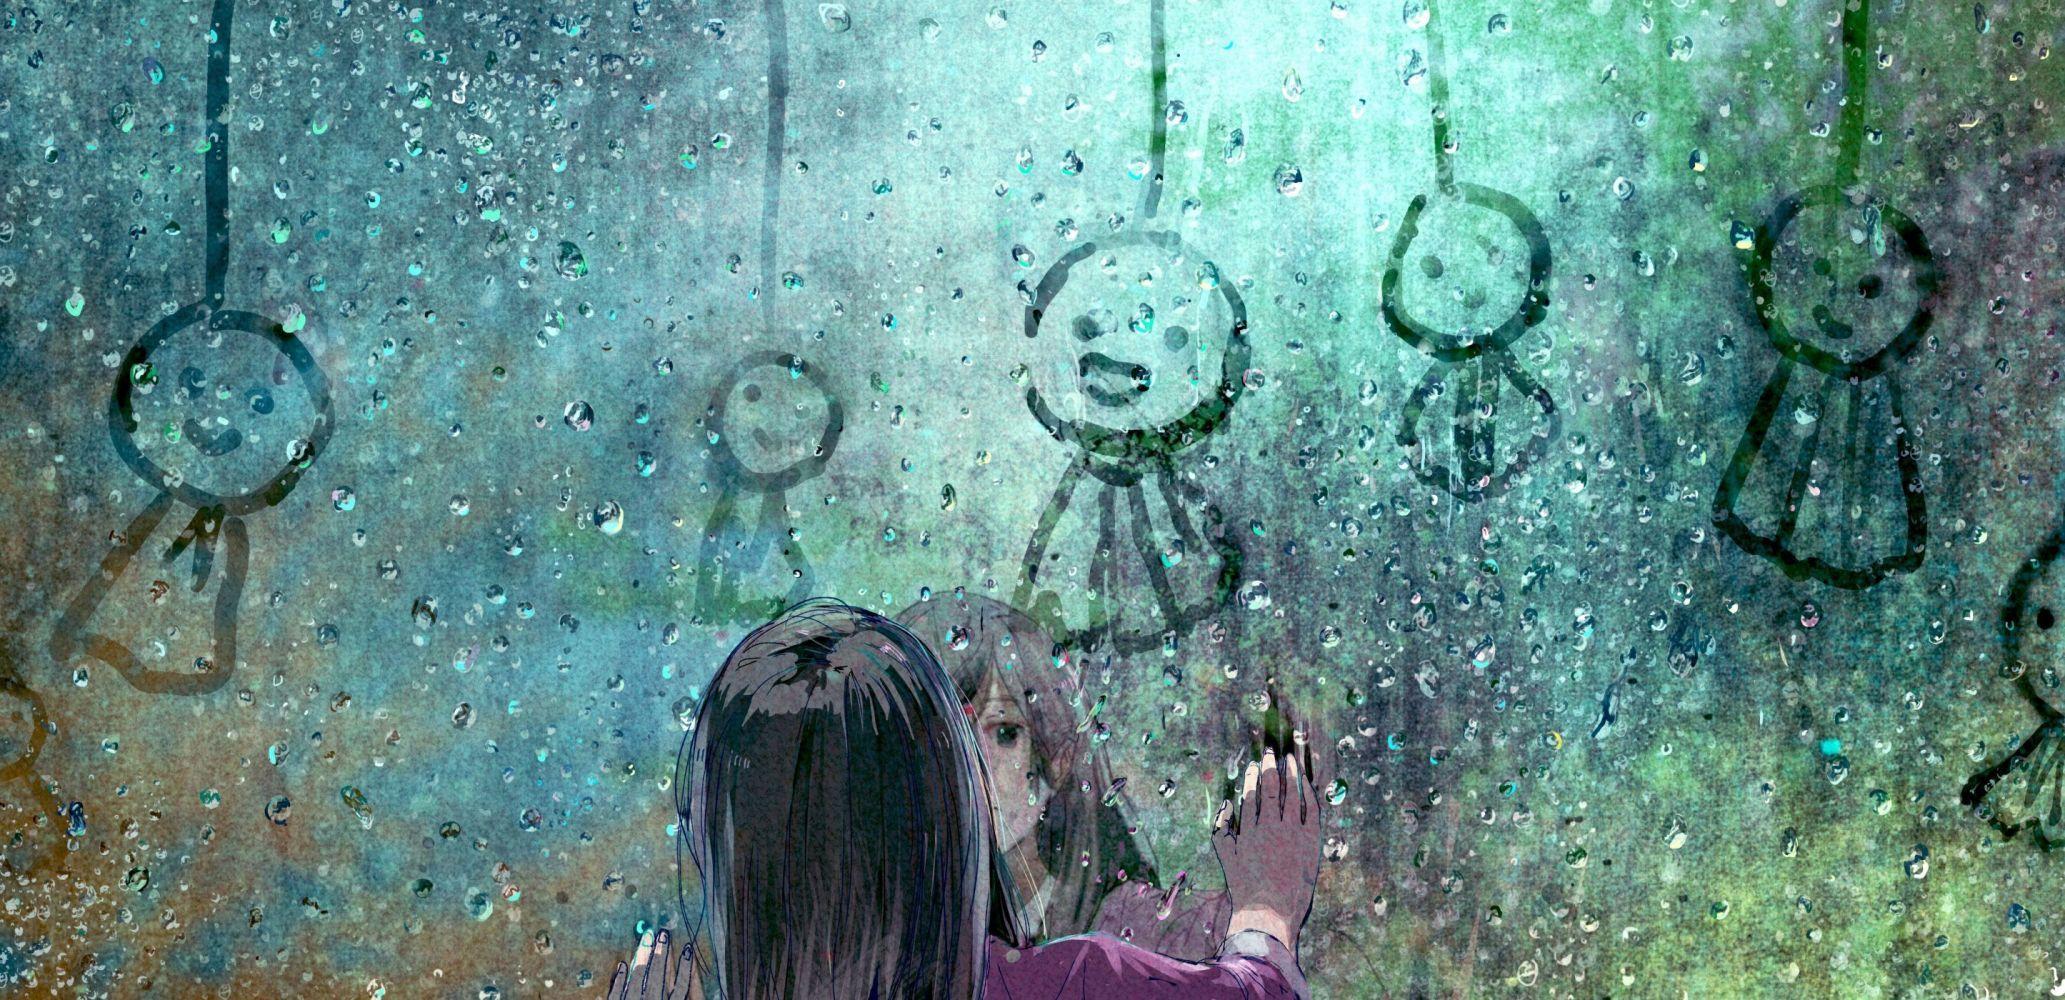 Anime Girls Original Characters Rain Black Hair Window Wallpaper Anime Artwork Wallpaper Anime Wallpaper Anime Artwork